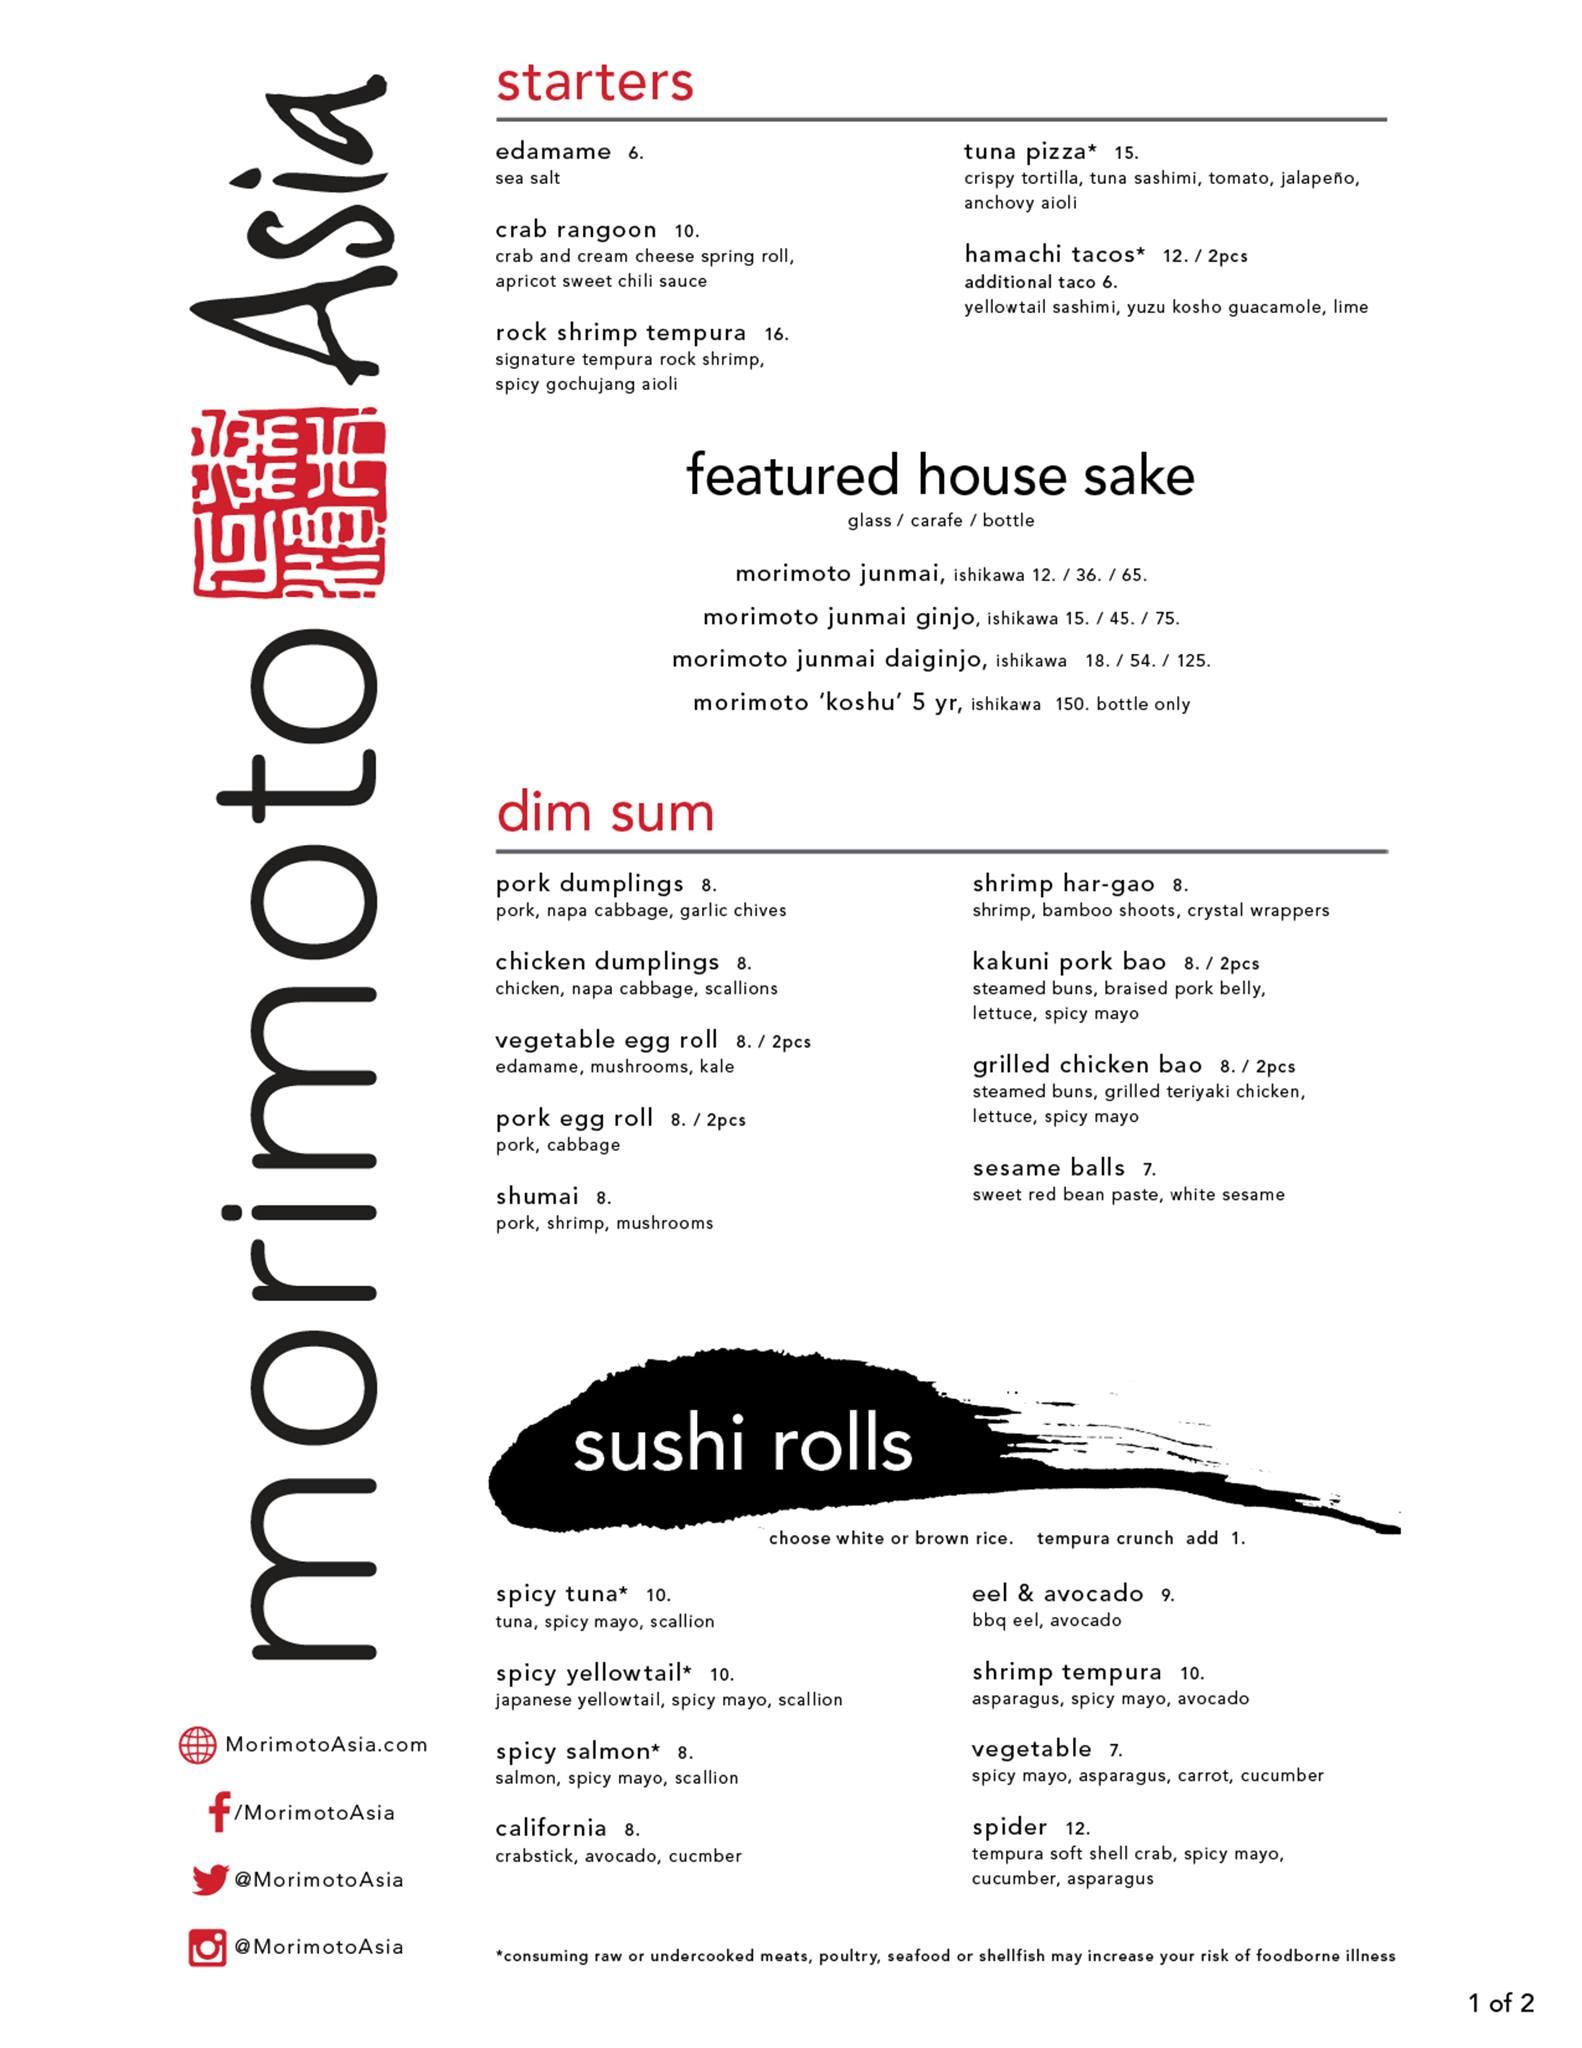 Morimoto Asia lunch menu - Page 1